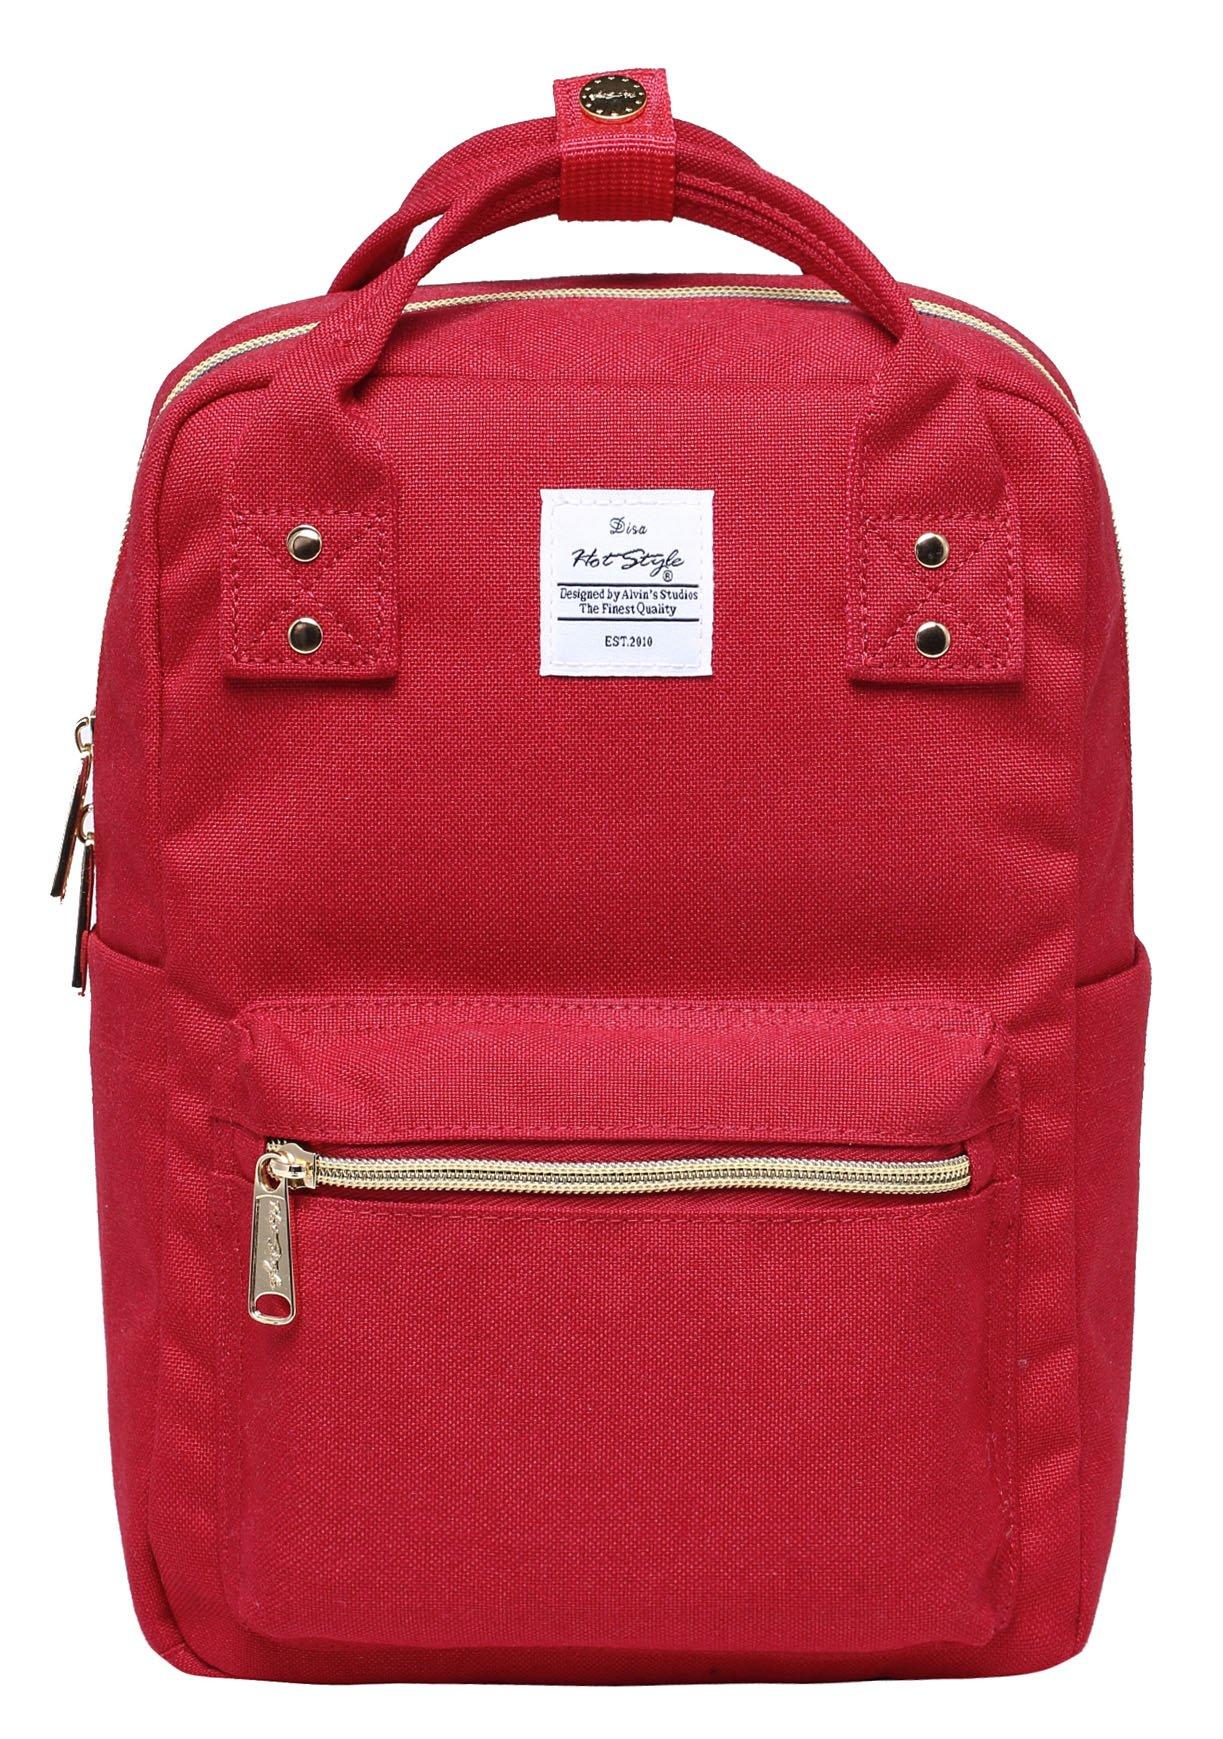 DISA MINI Small Backpack Purse | Fits 10-inch iPad | 11.6''x8''x4.5'' | Red